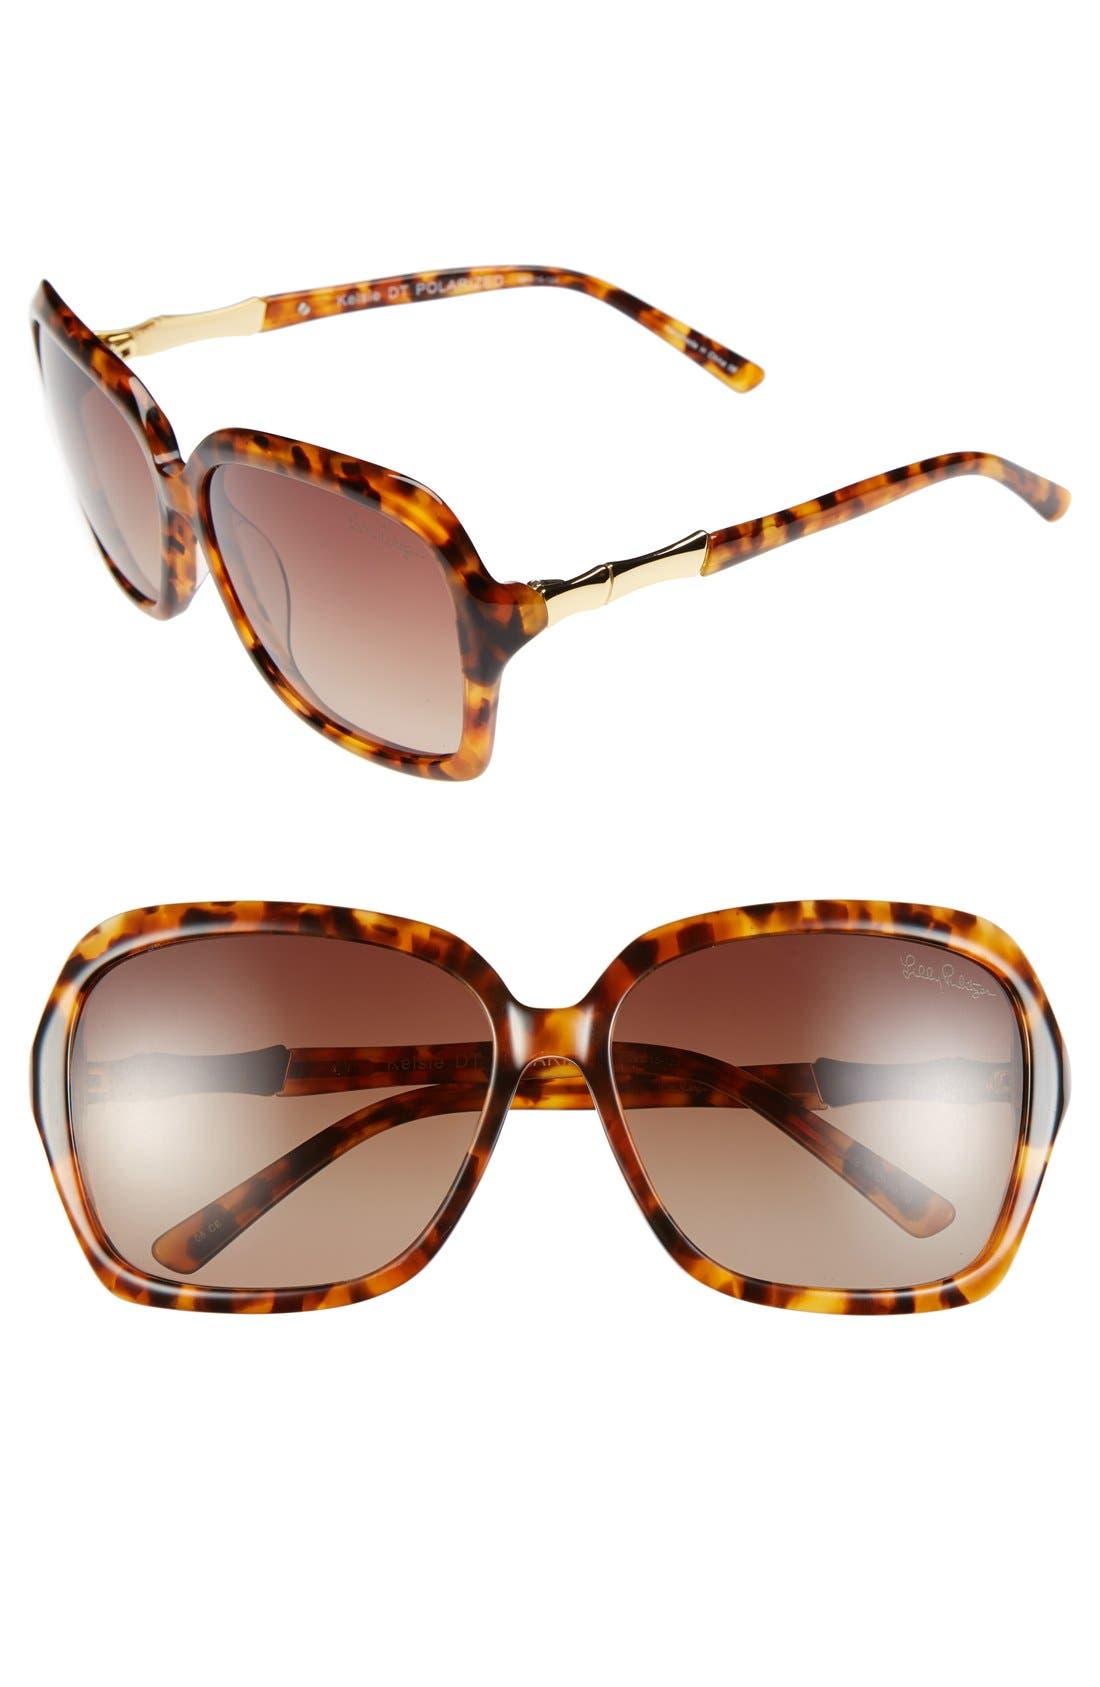 Main Image - Lilly Pulitzer® 'Kelsie' 59mm Polarized Sunglasses